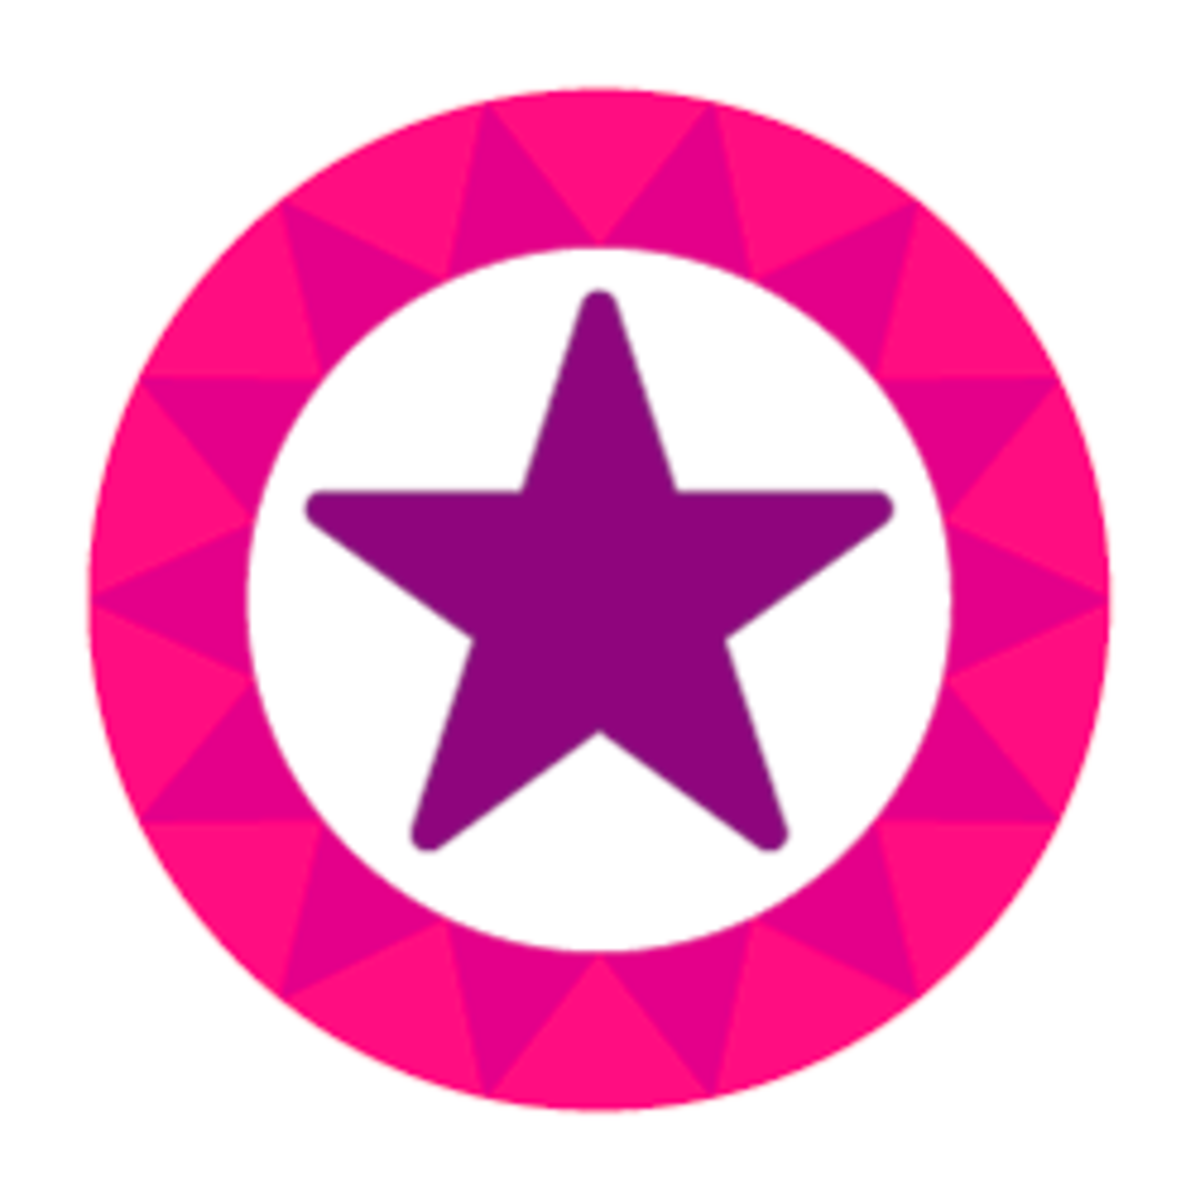 purple-star-lens